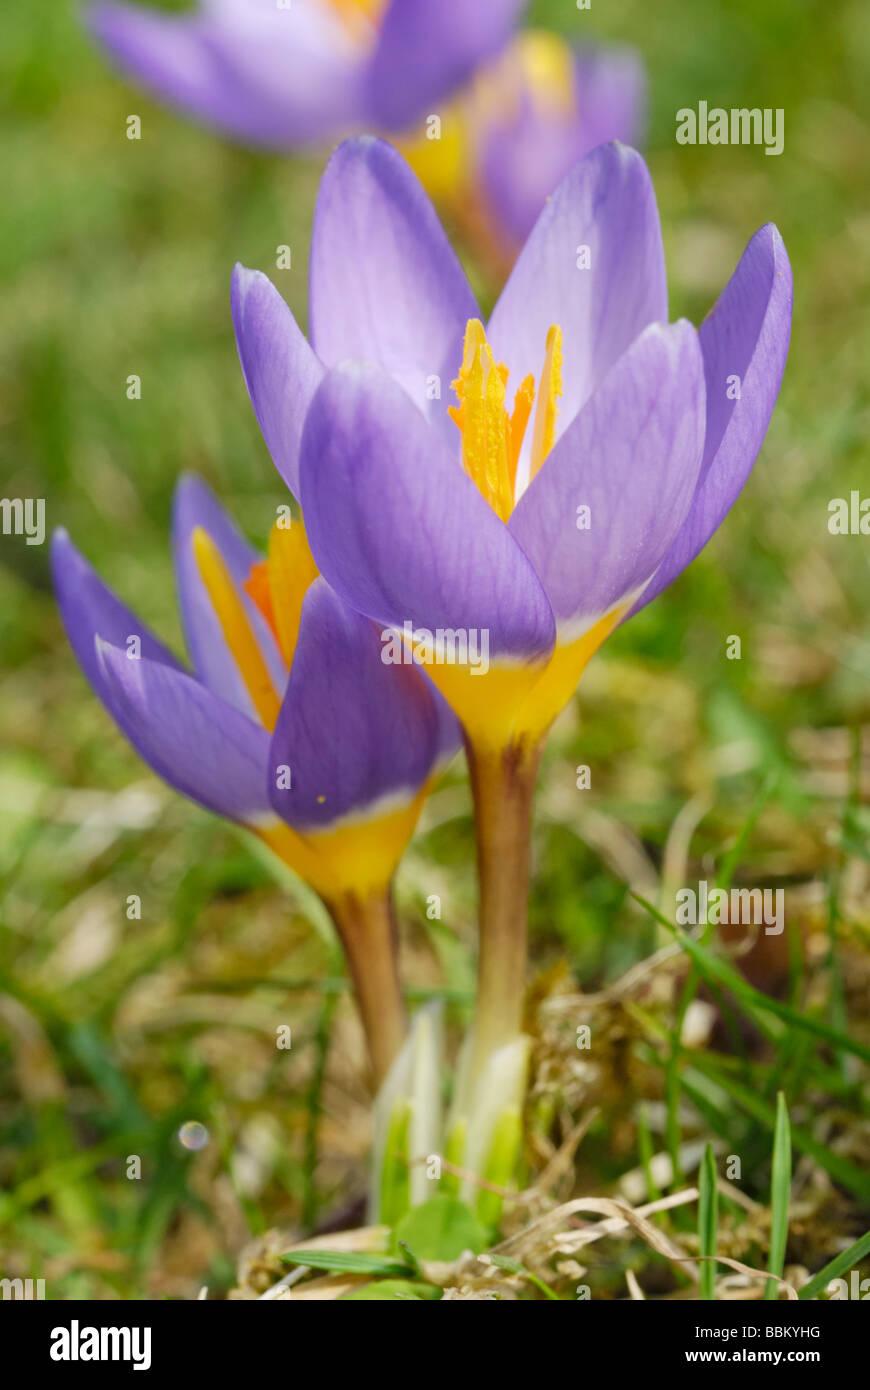 Violet crocus (Crocus sativa), flowers on meadow Stock Photo